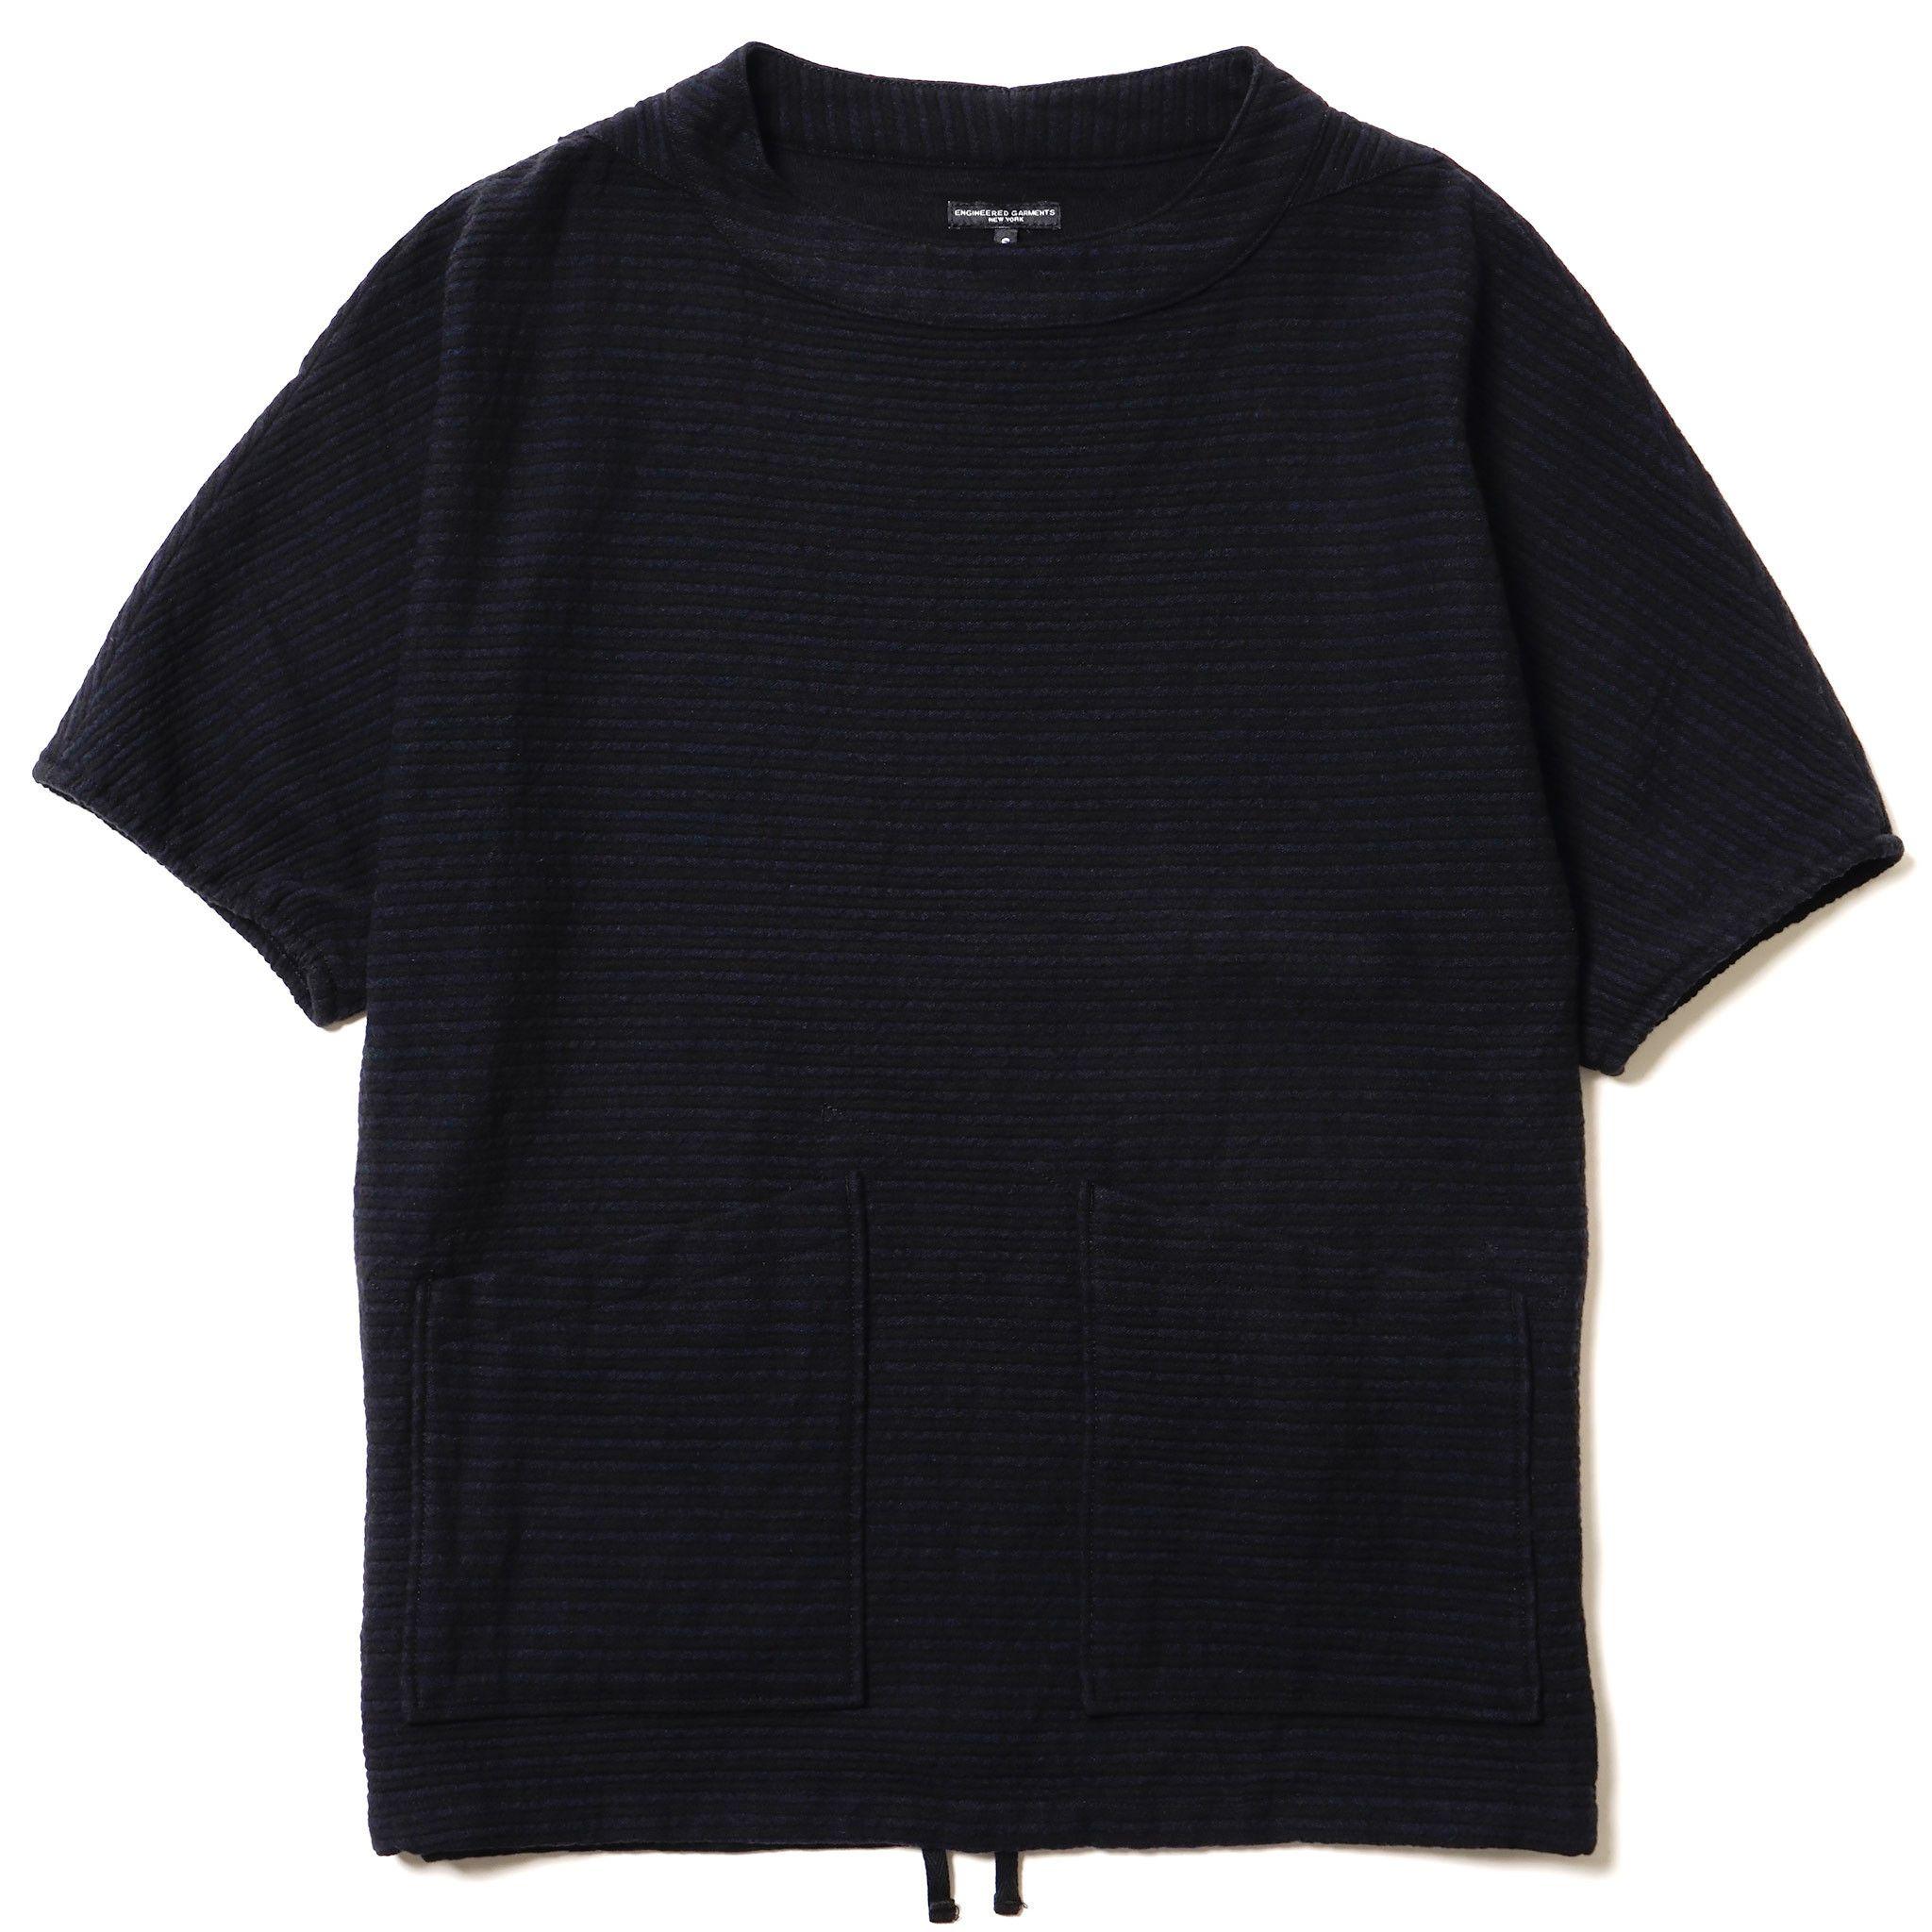 Engineered Garments S/S Smock - Wool Horizontal Stripe